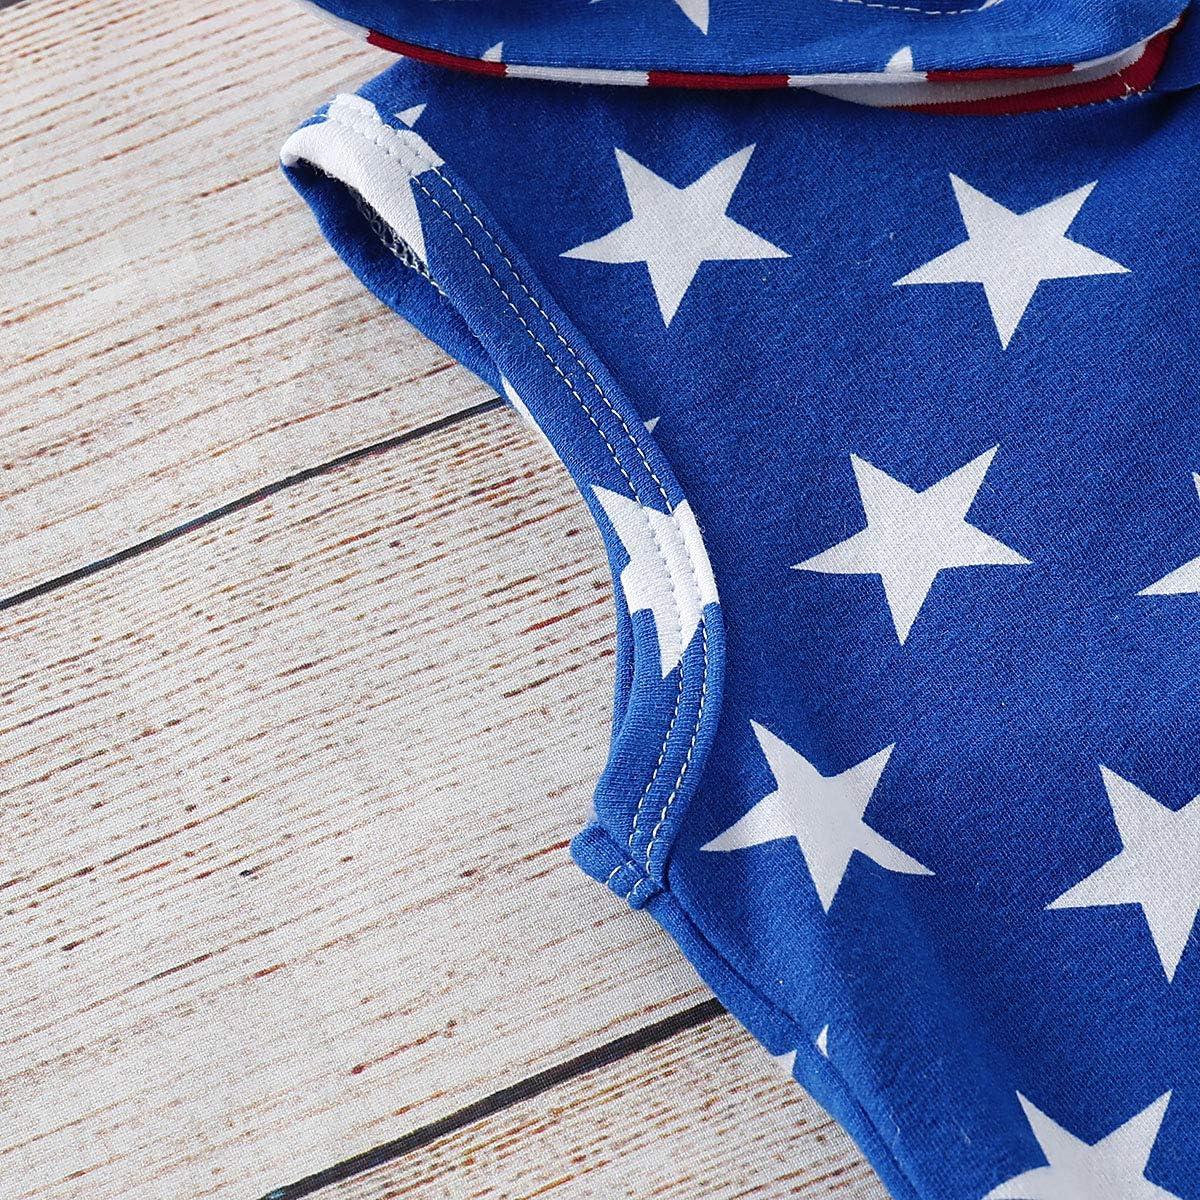 2Pcs/Set Baby Boy Patriotic 4th of July Outfits,Sleeveless T-Shirt Top+Harem Pants